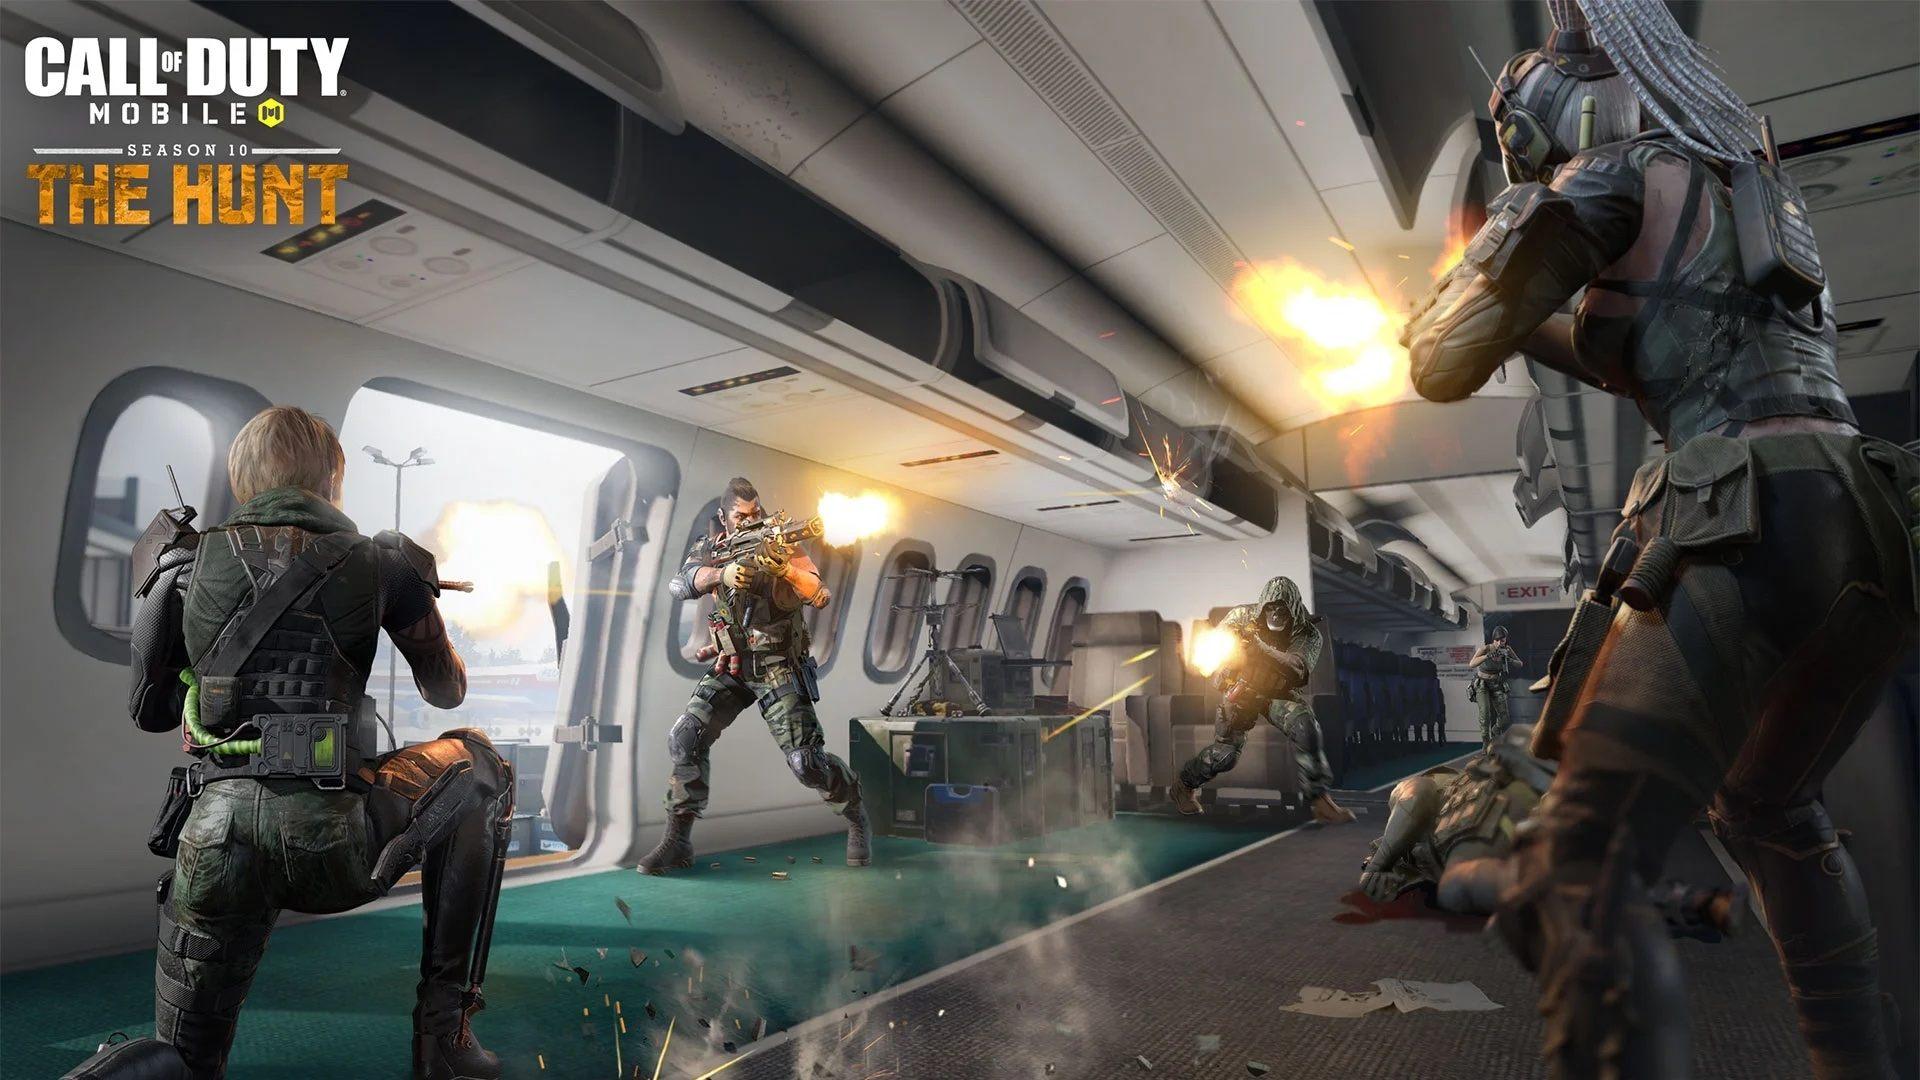 Activision đang phát triển một tựa game Call of Duty Mobile mới